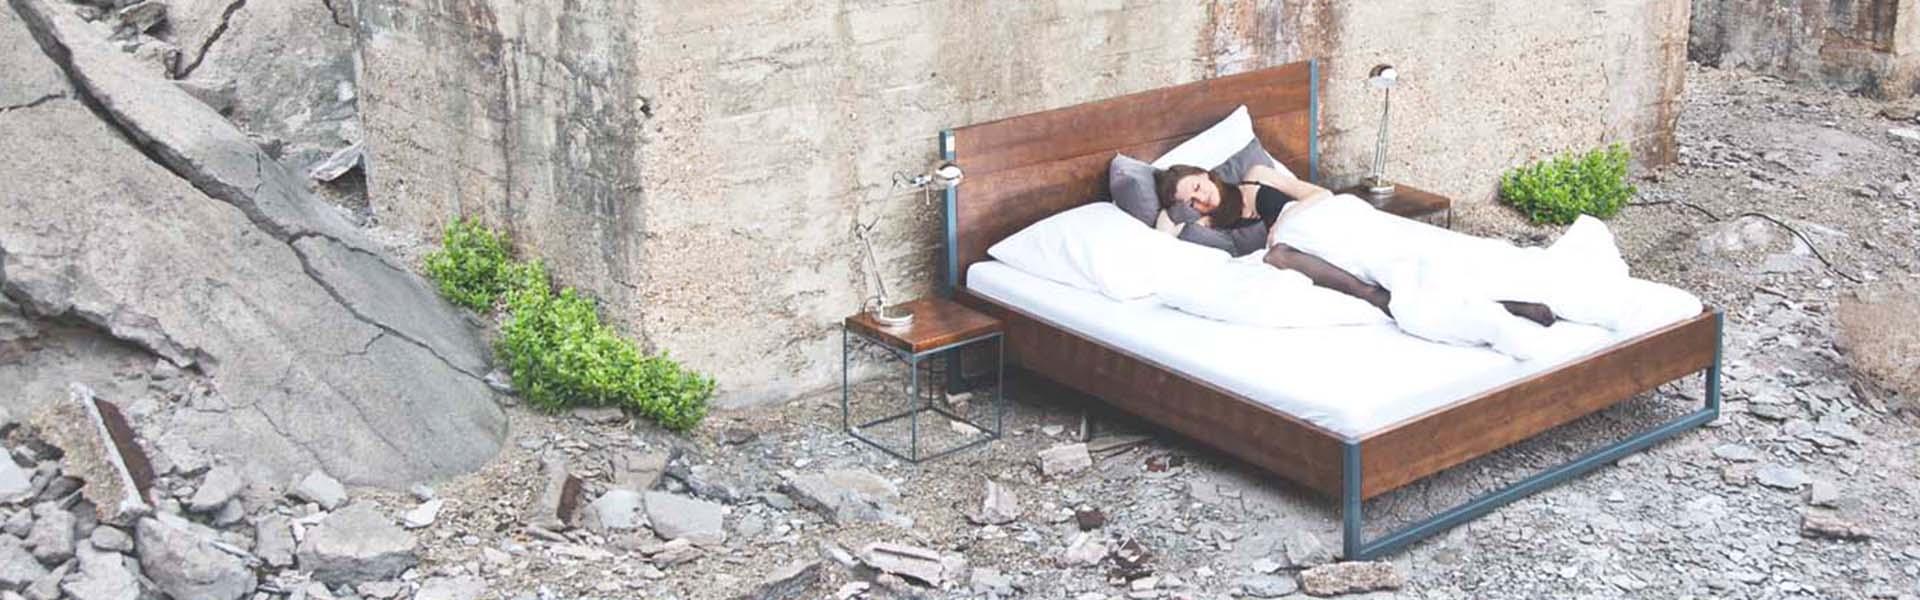 bett industrial design jetzt online entdecken satamo. Black Bedroom Furniture Sets. Home Design Ideas